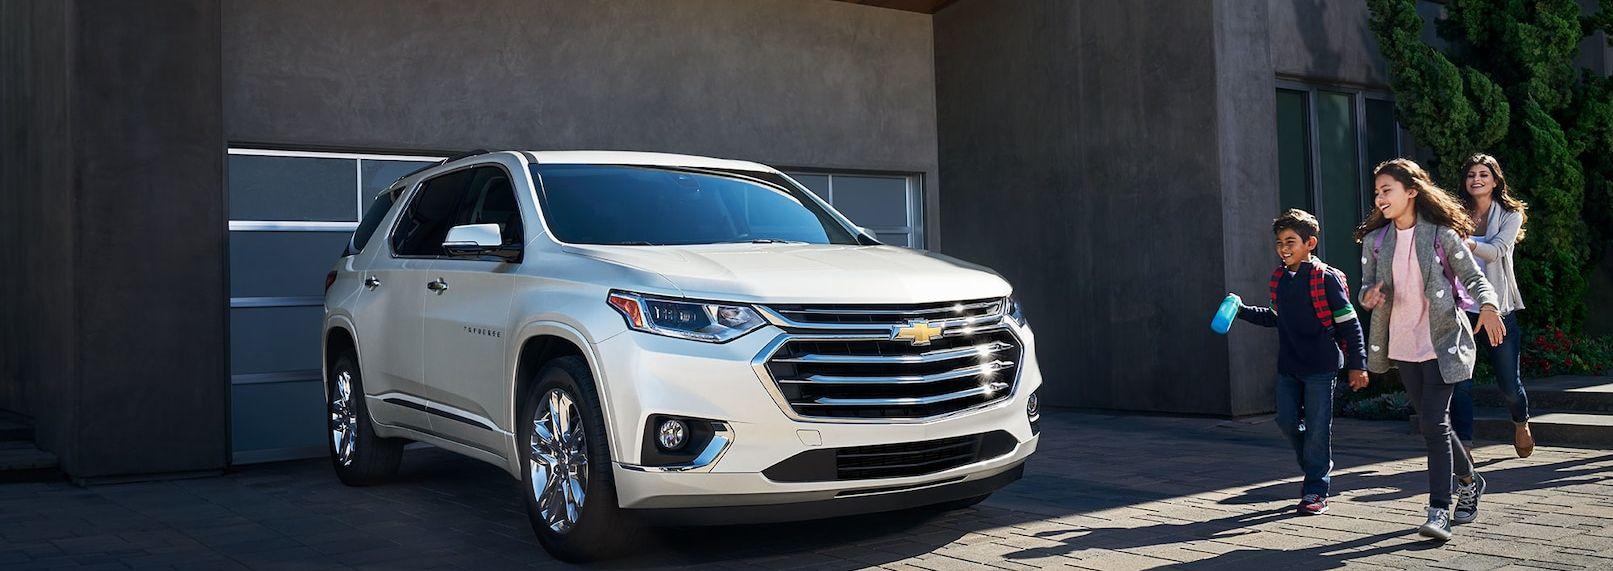 2019 Chevrolet Traverse Financing near Escondido, CA